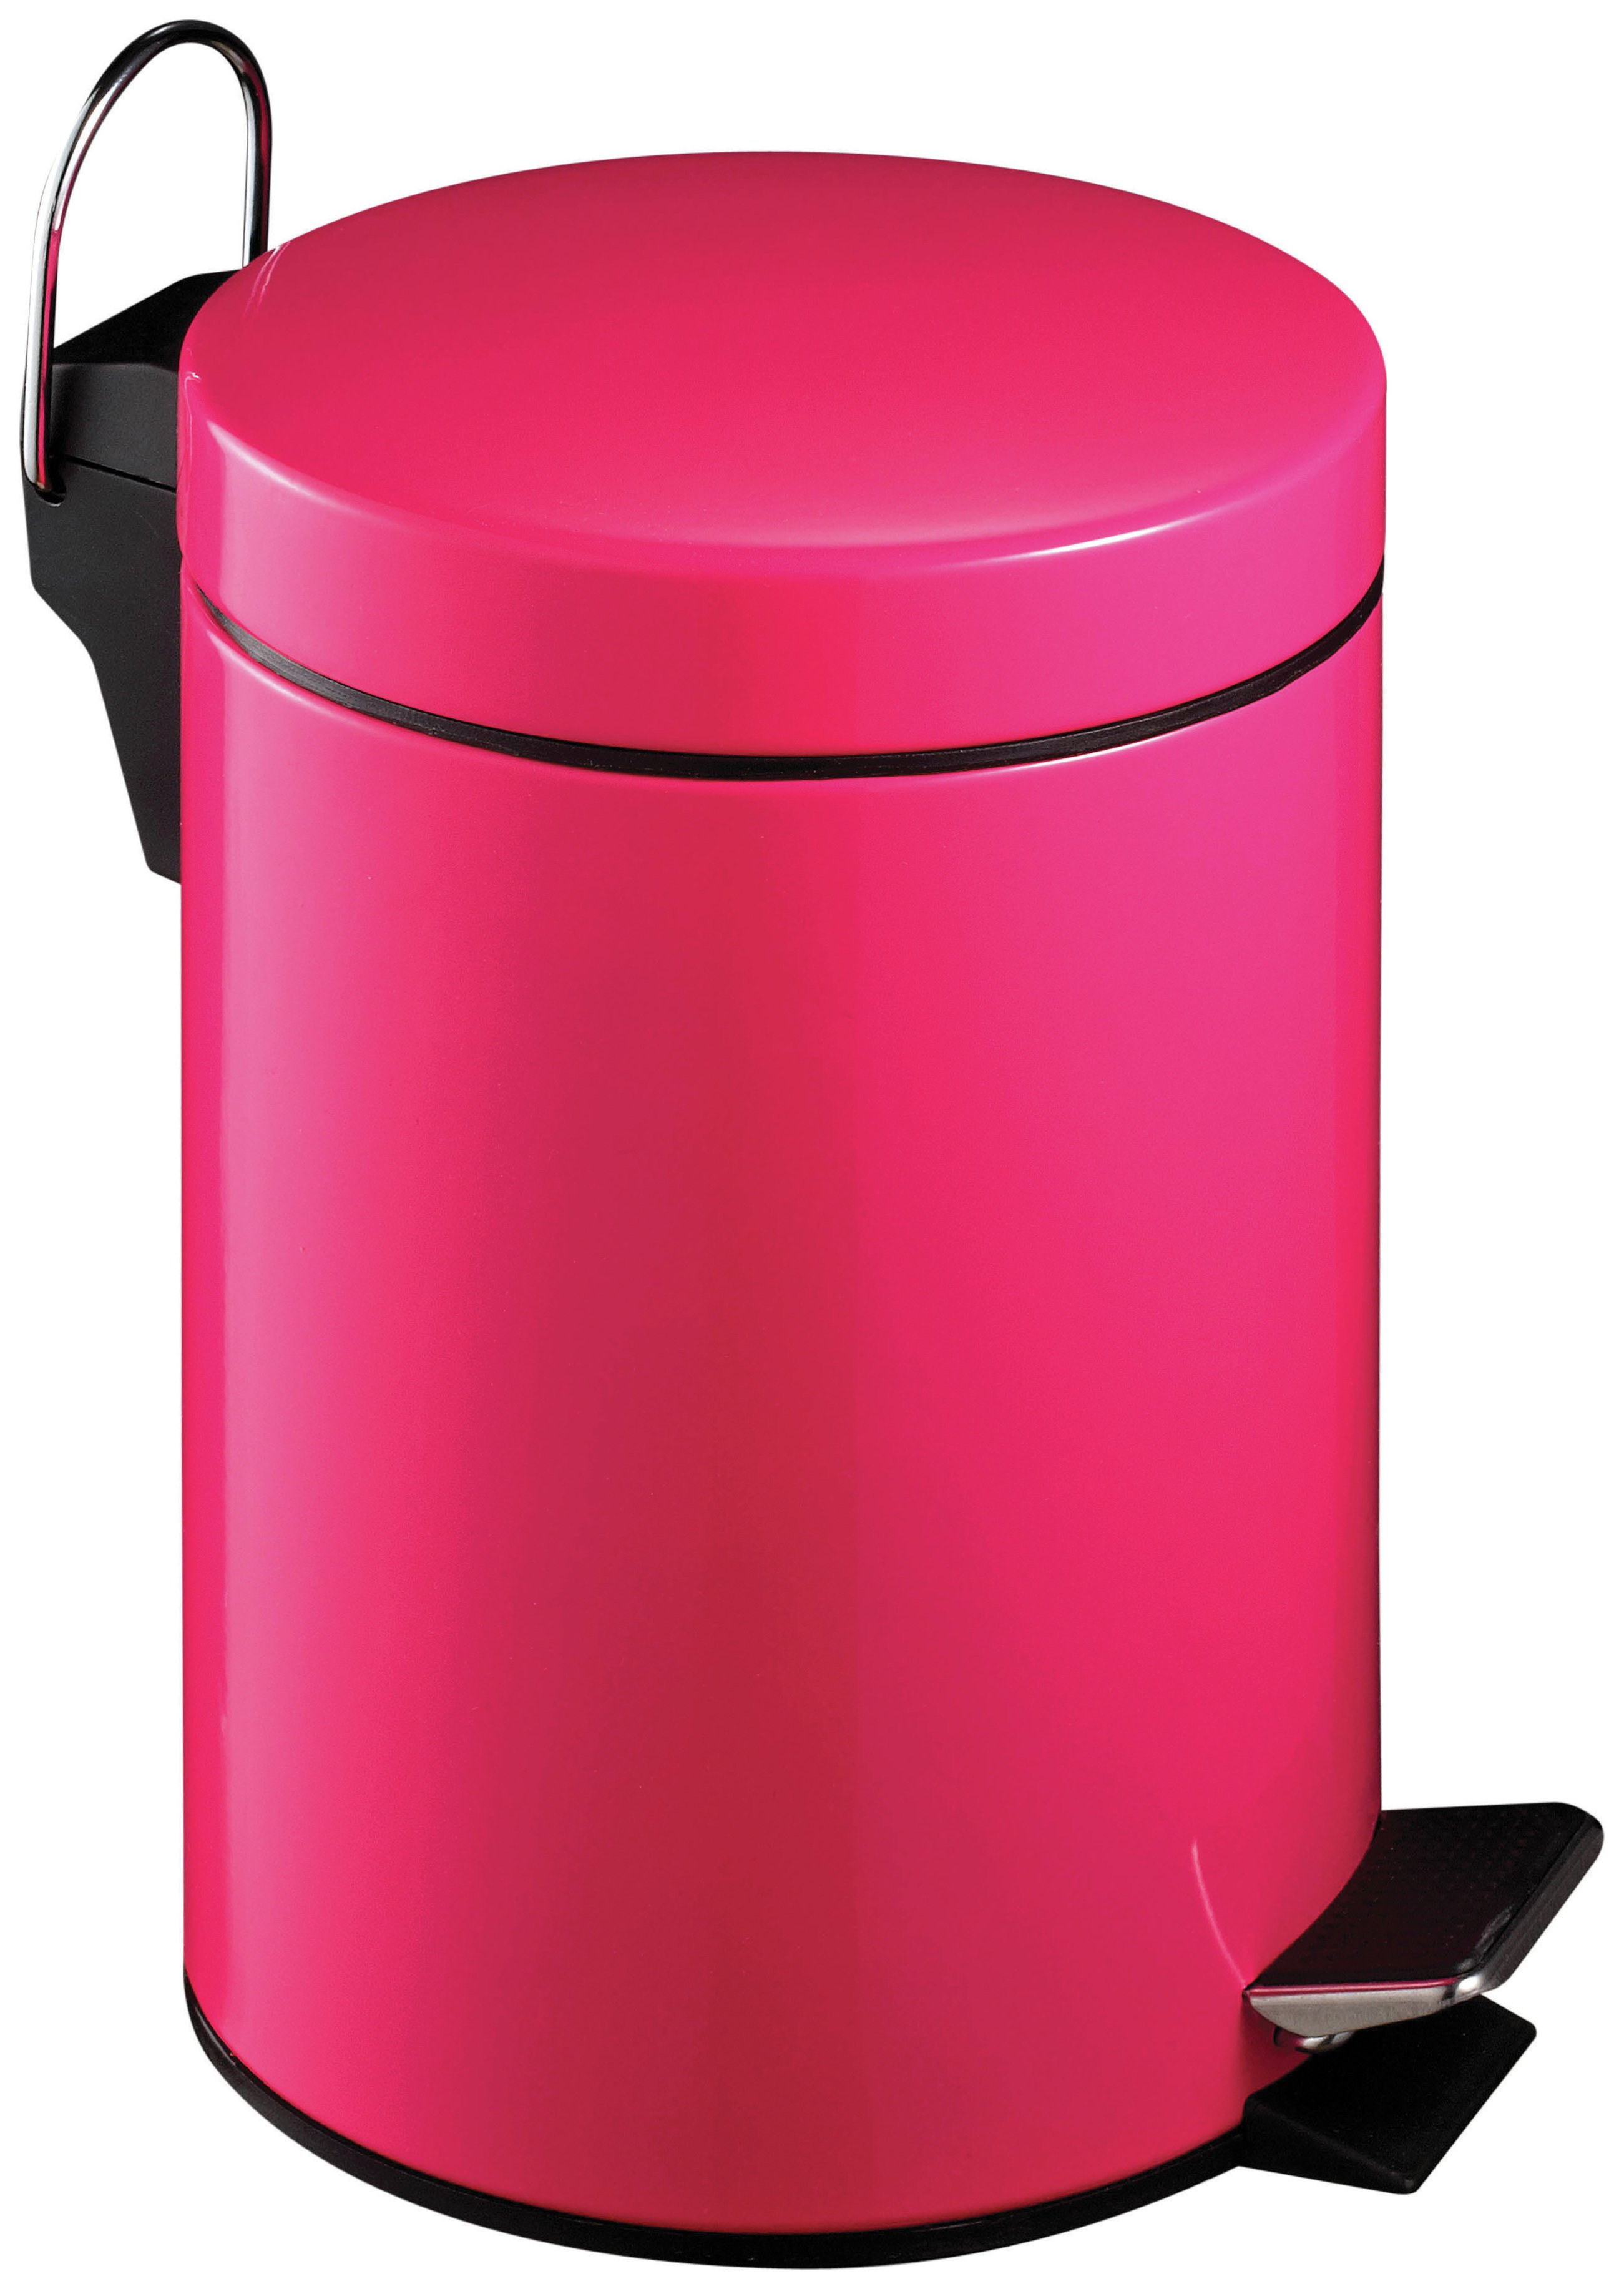 Premier Housewares 3 Litre Hot Pink Pedal Bin.